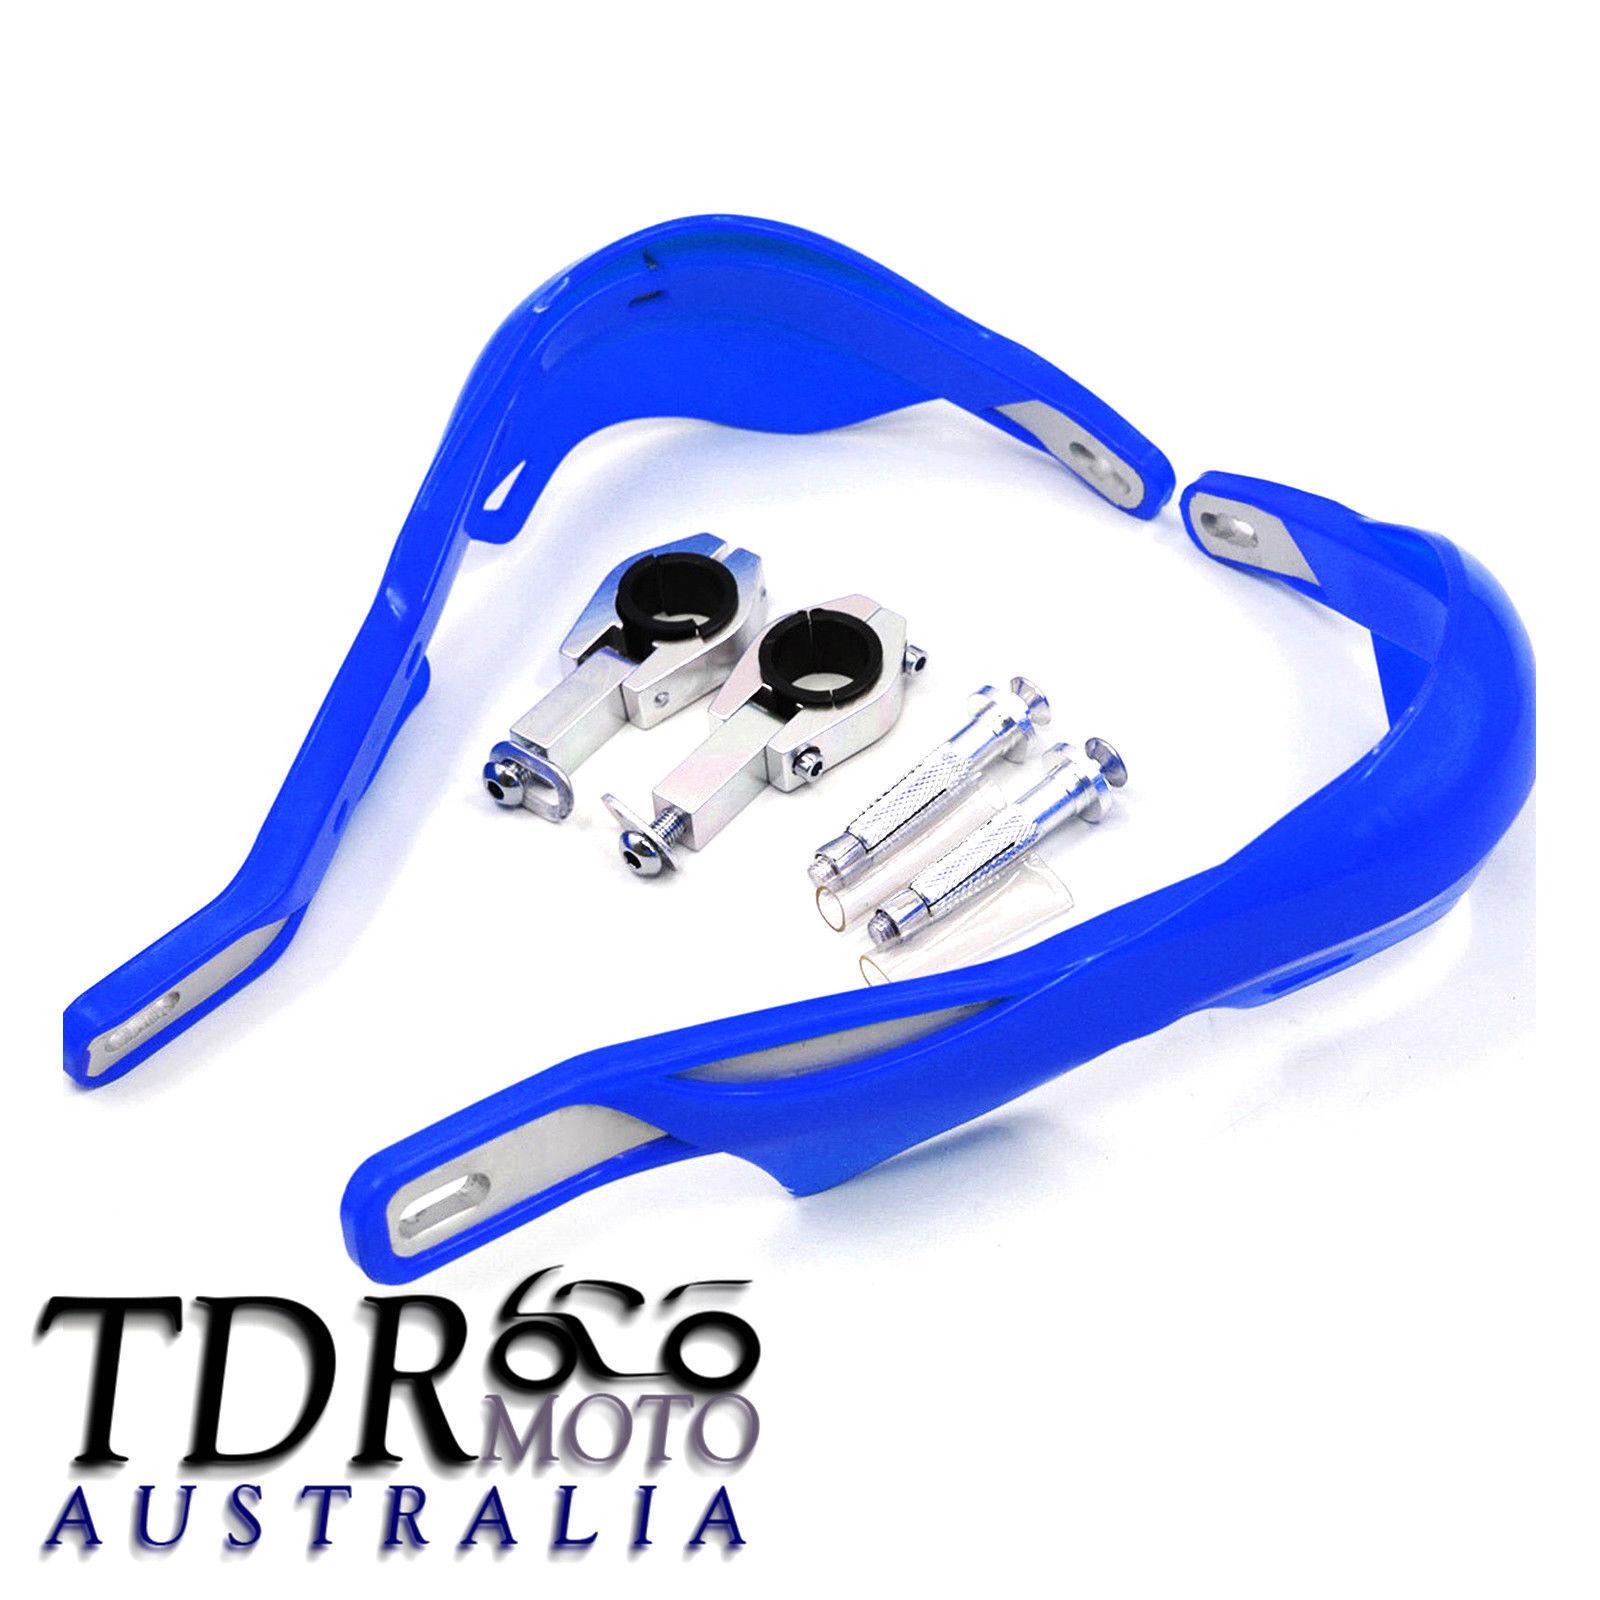 Generic Universal Plastic Handguards for 28mm and 22mm Handlebars Blue